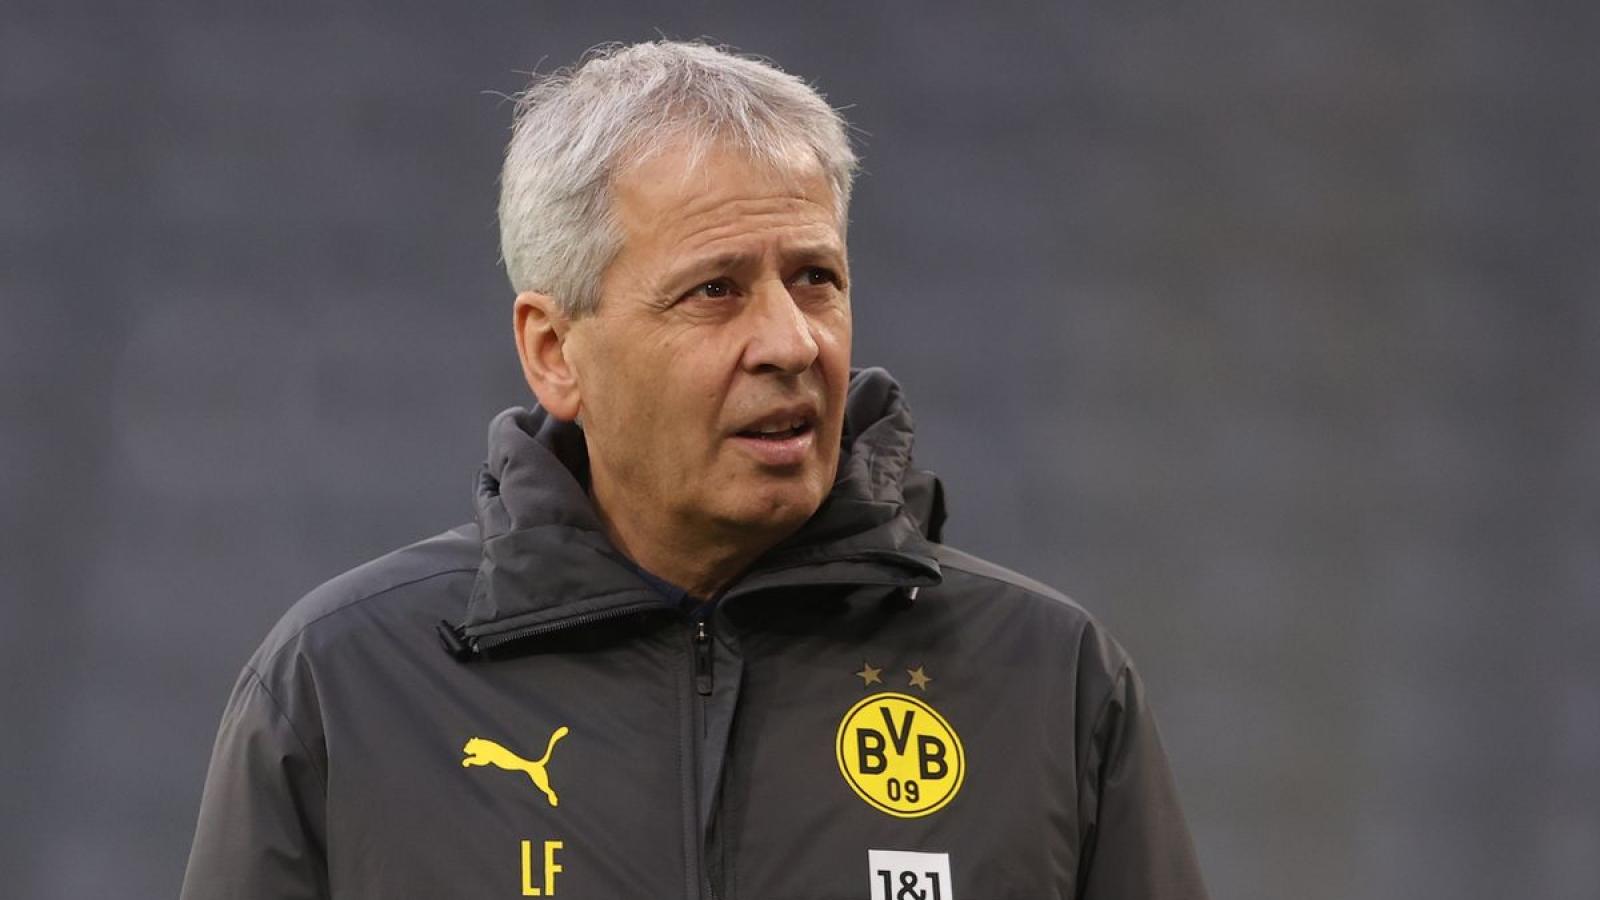 Thua 4 trận sau 11 vòng ở Bundesliga, Dortmund sa thải HLV Favre